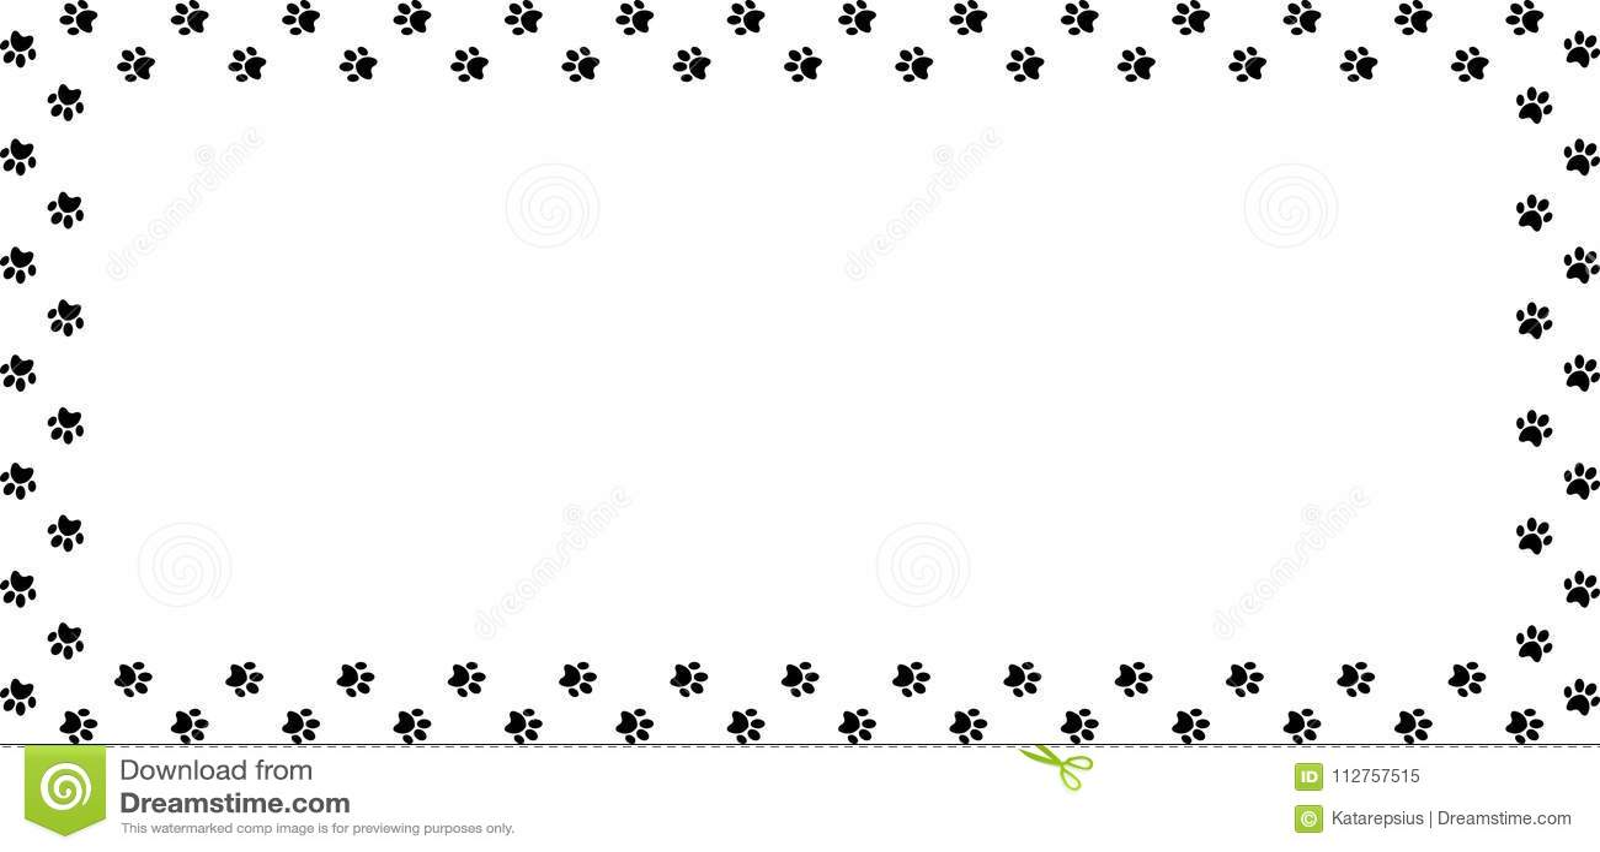 Rectangle Frame Made Of Black Animal Paw Prints On White Background